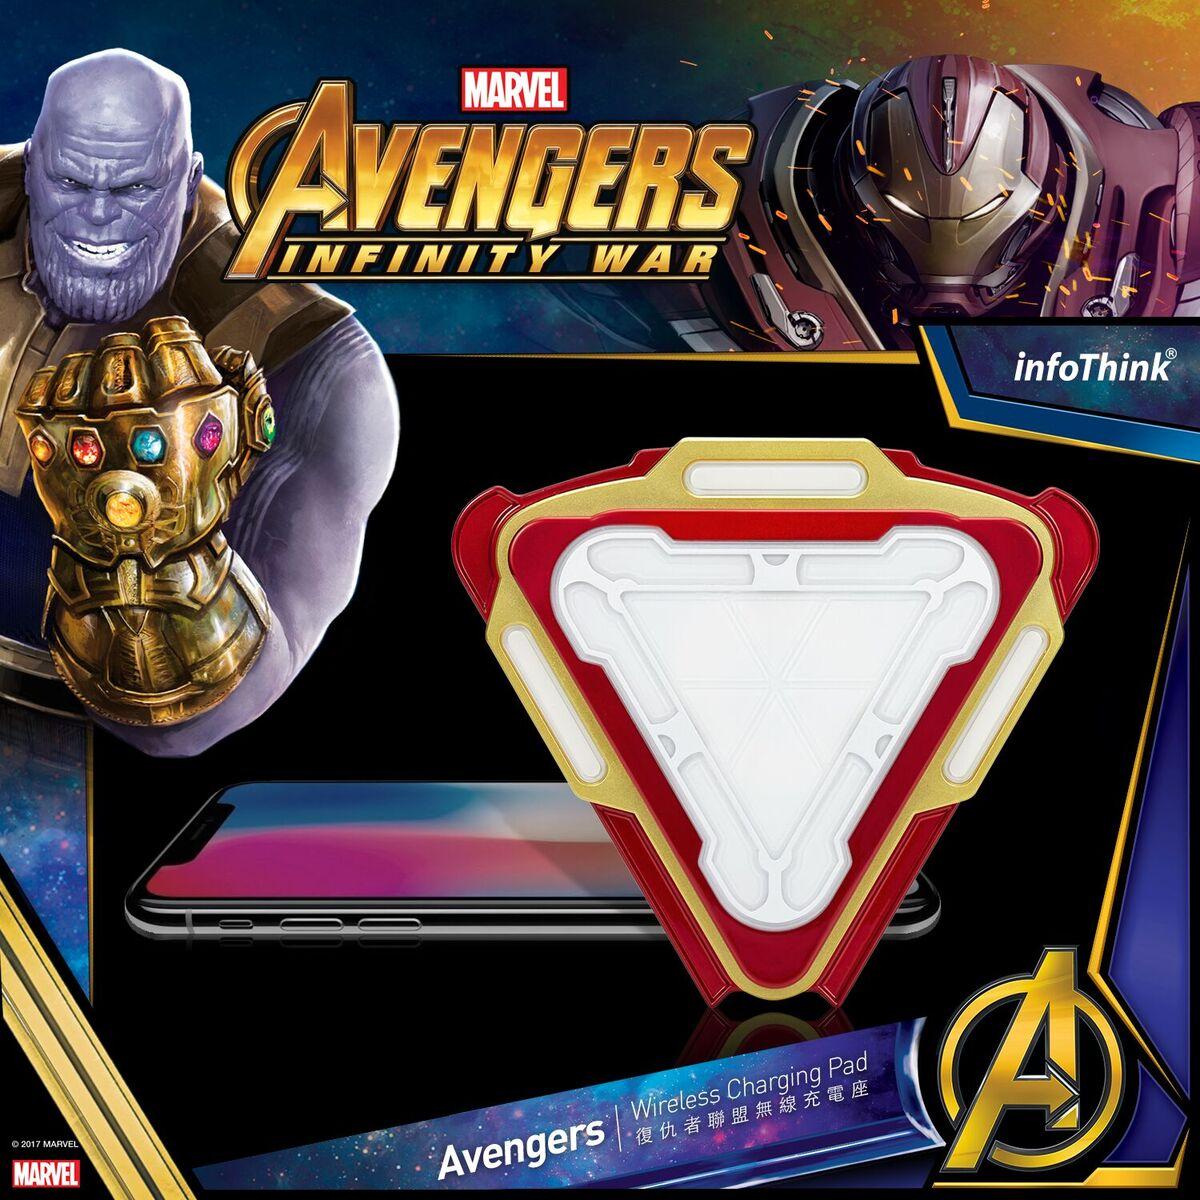 Avengers Wireless Charging Pad แท่นชาร์จไร้สาย